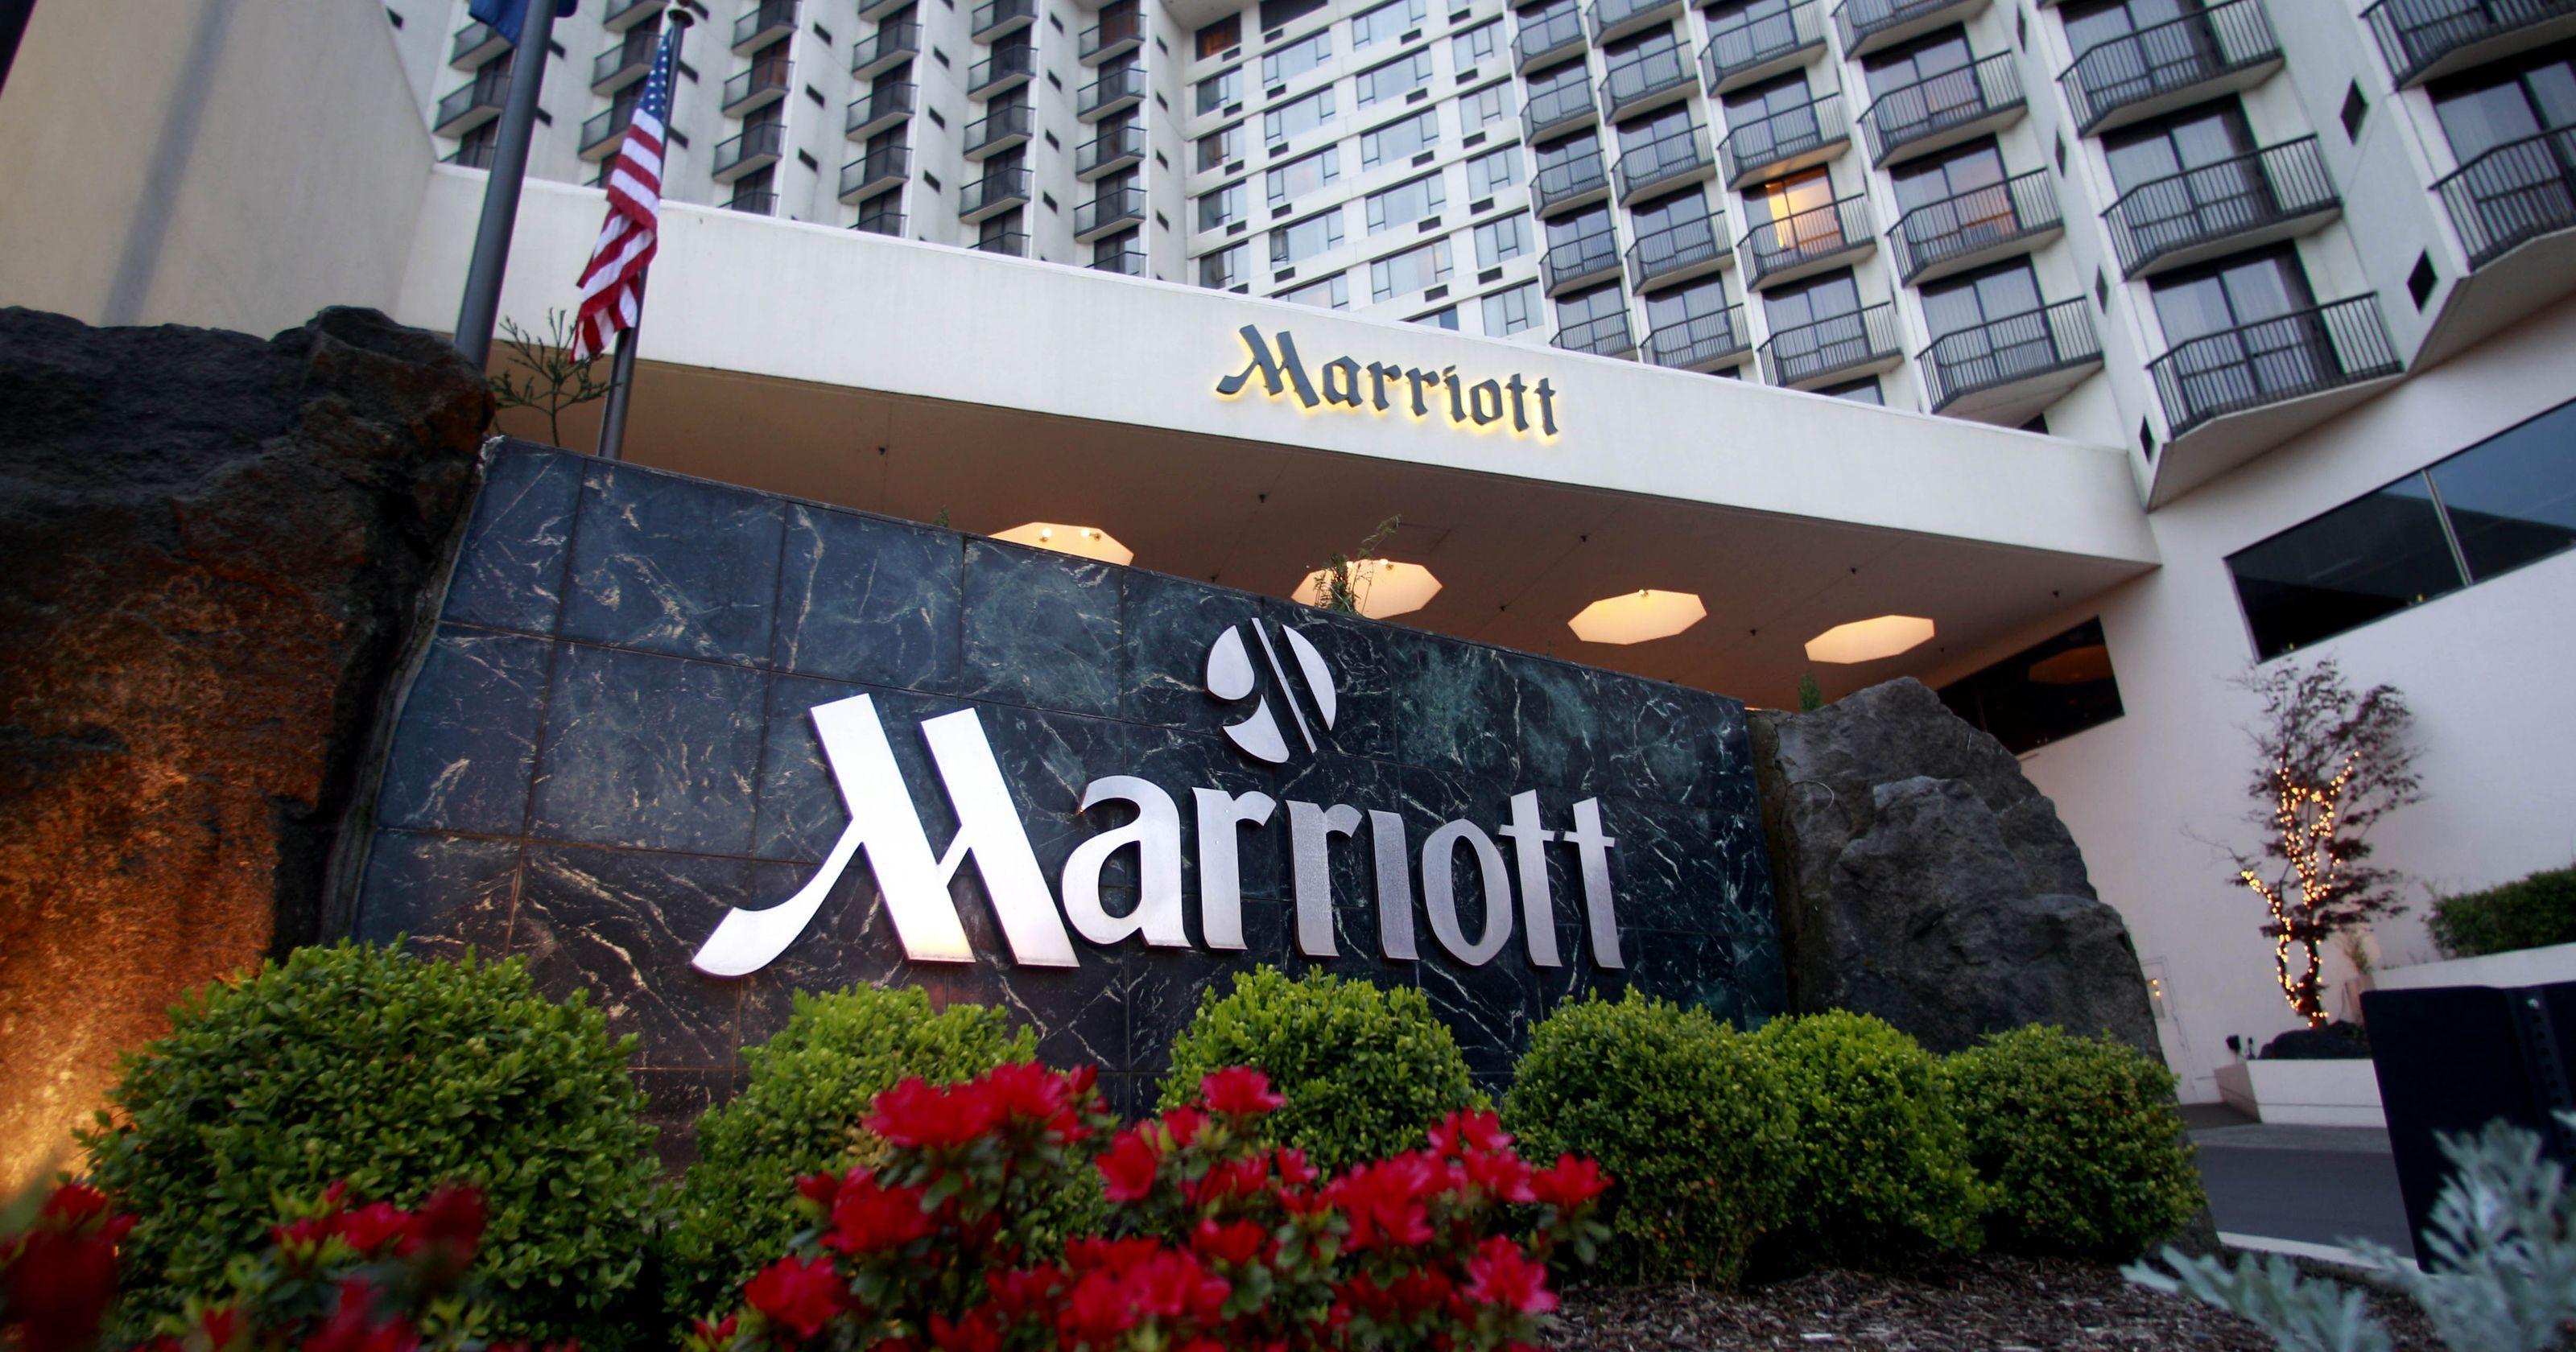 Marriott Adds Perks To Its Rewards Program Starwood Hotels Marriott Hotels Marriott